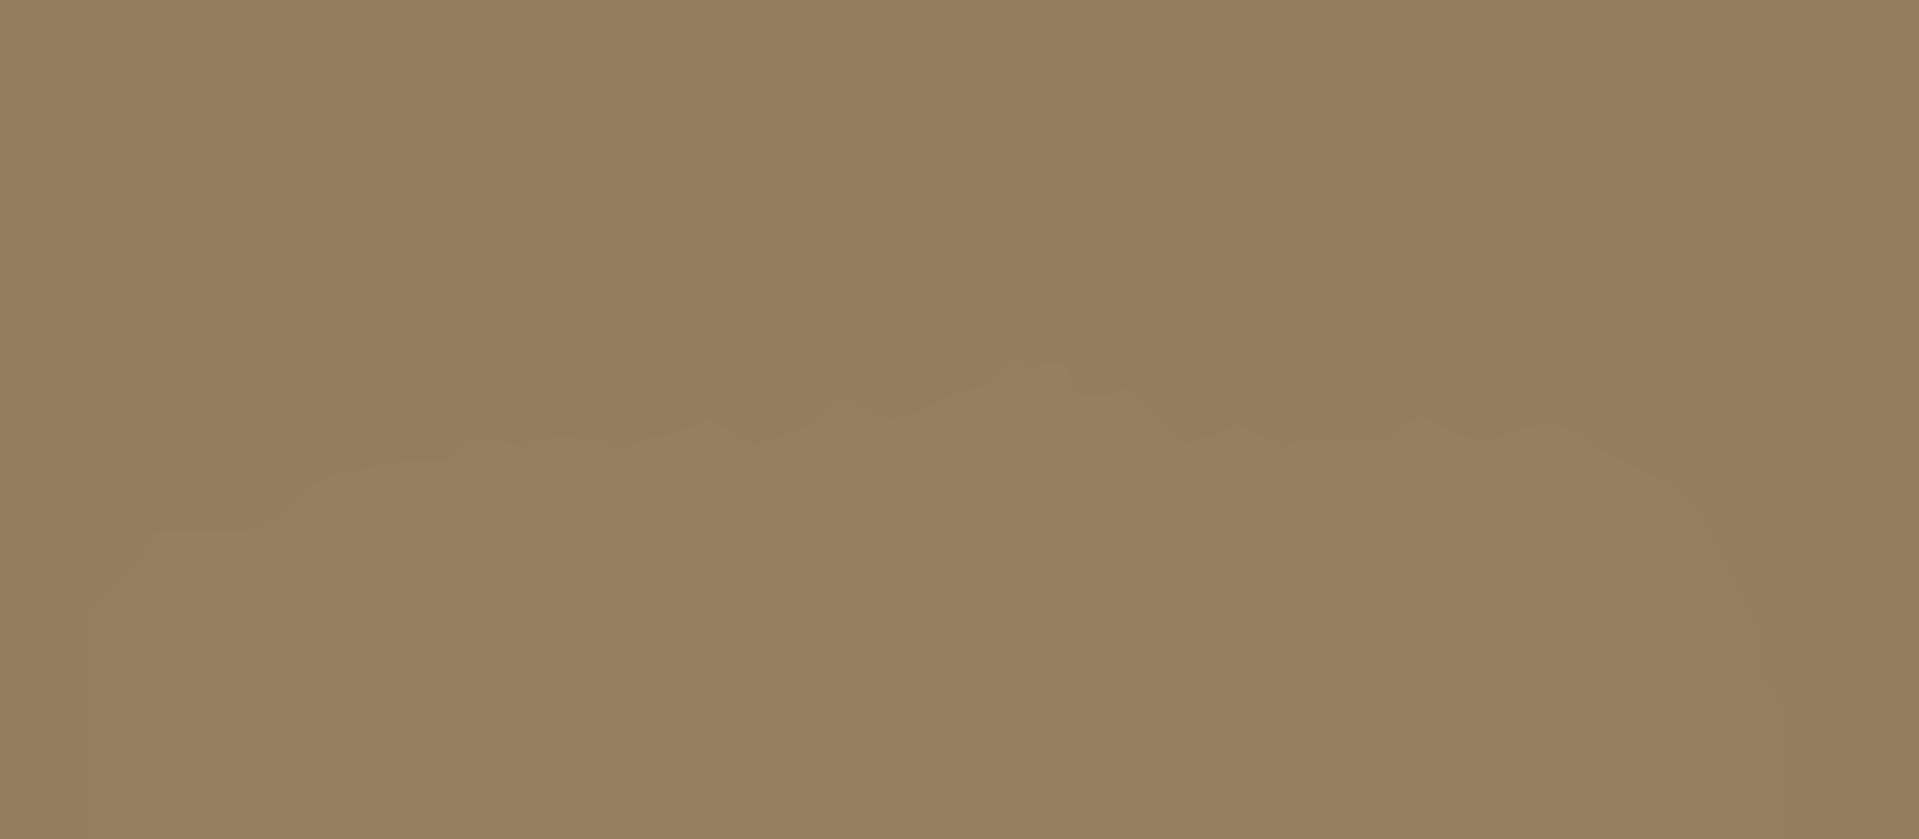 Dalay Zigarrenblog